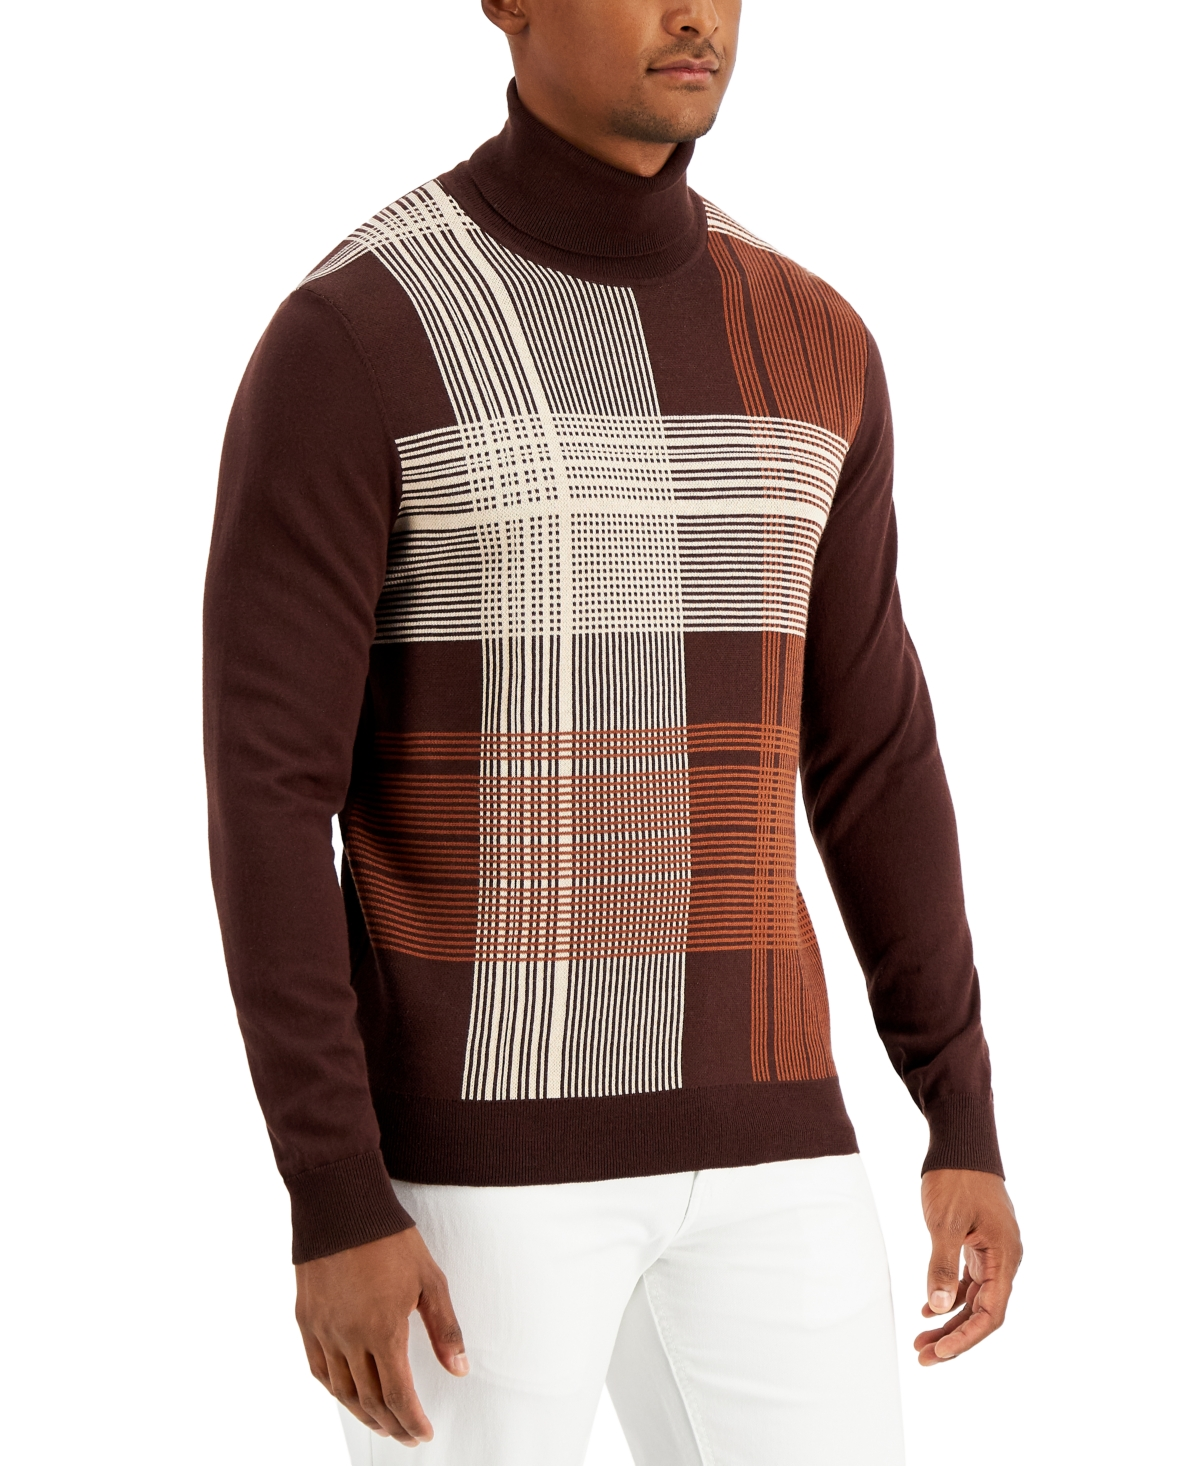 1960s Mens Shirts | 60s Mod Shirts, Hippie Shirts Alfani Mens Plaid Turtleneck Sweater Created for Macys $60.00 AT vintagedancer.com